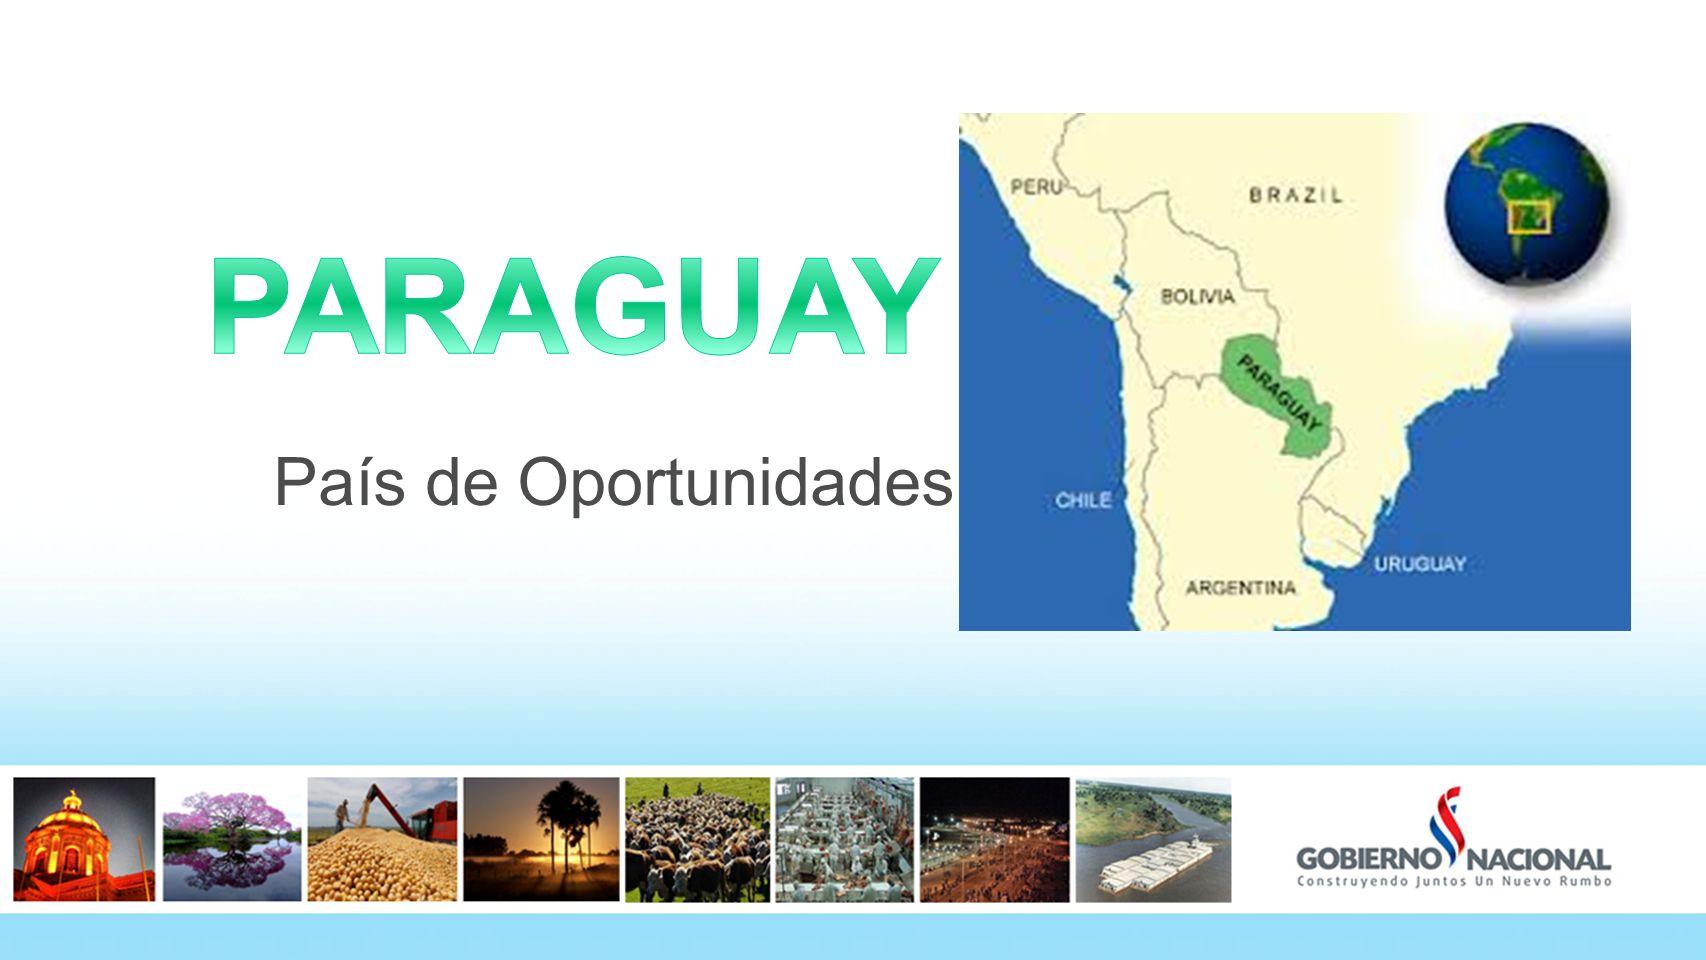 PARAGUAY País de Oportunidades 2 2